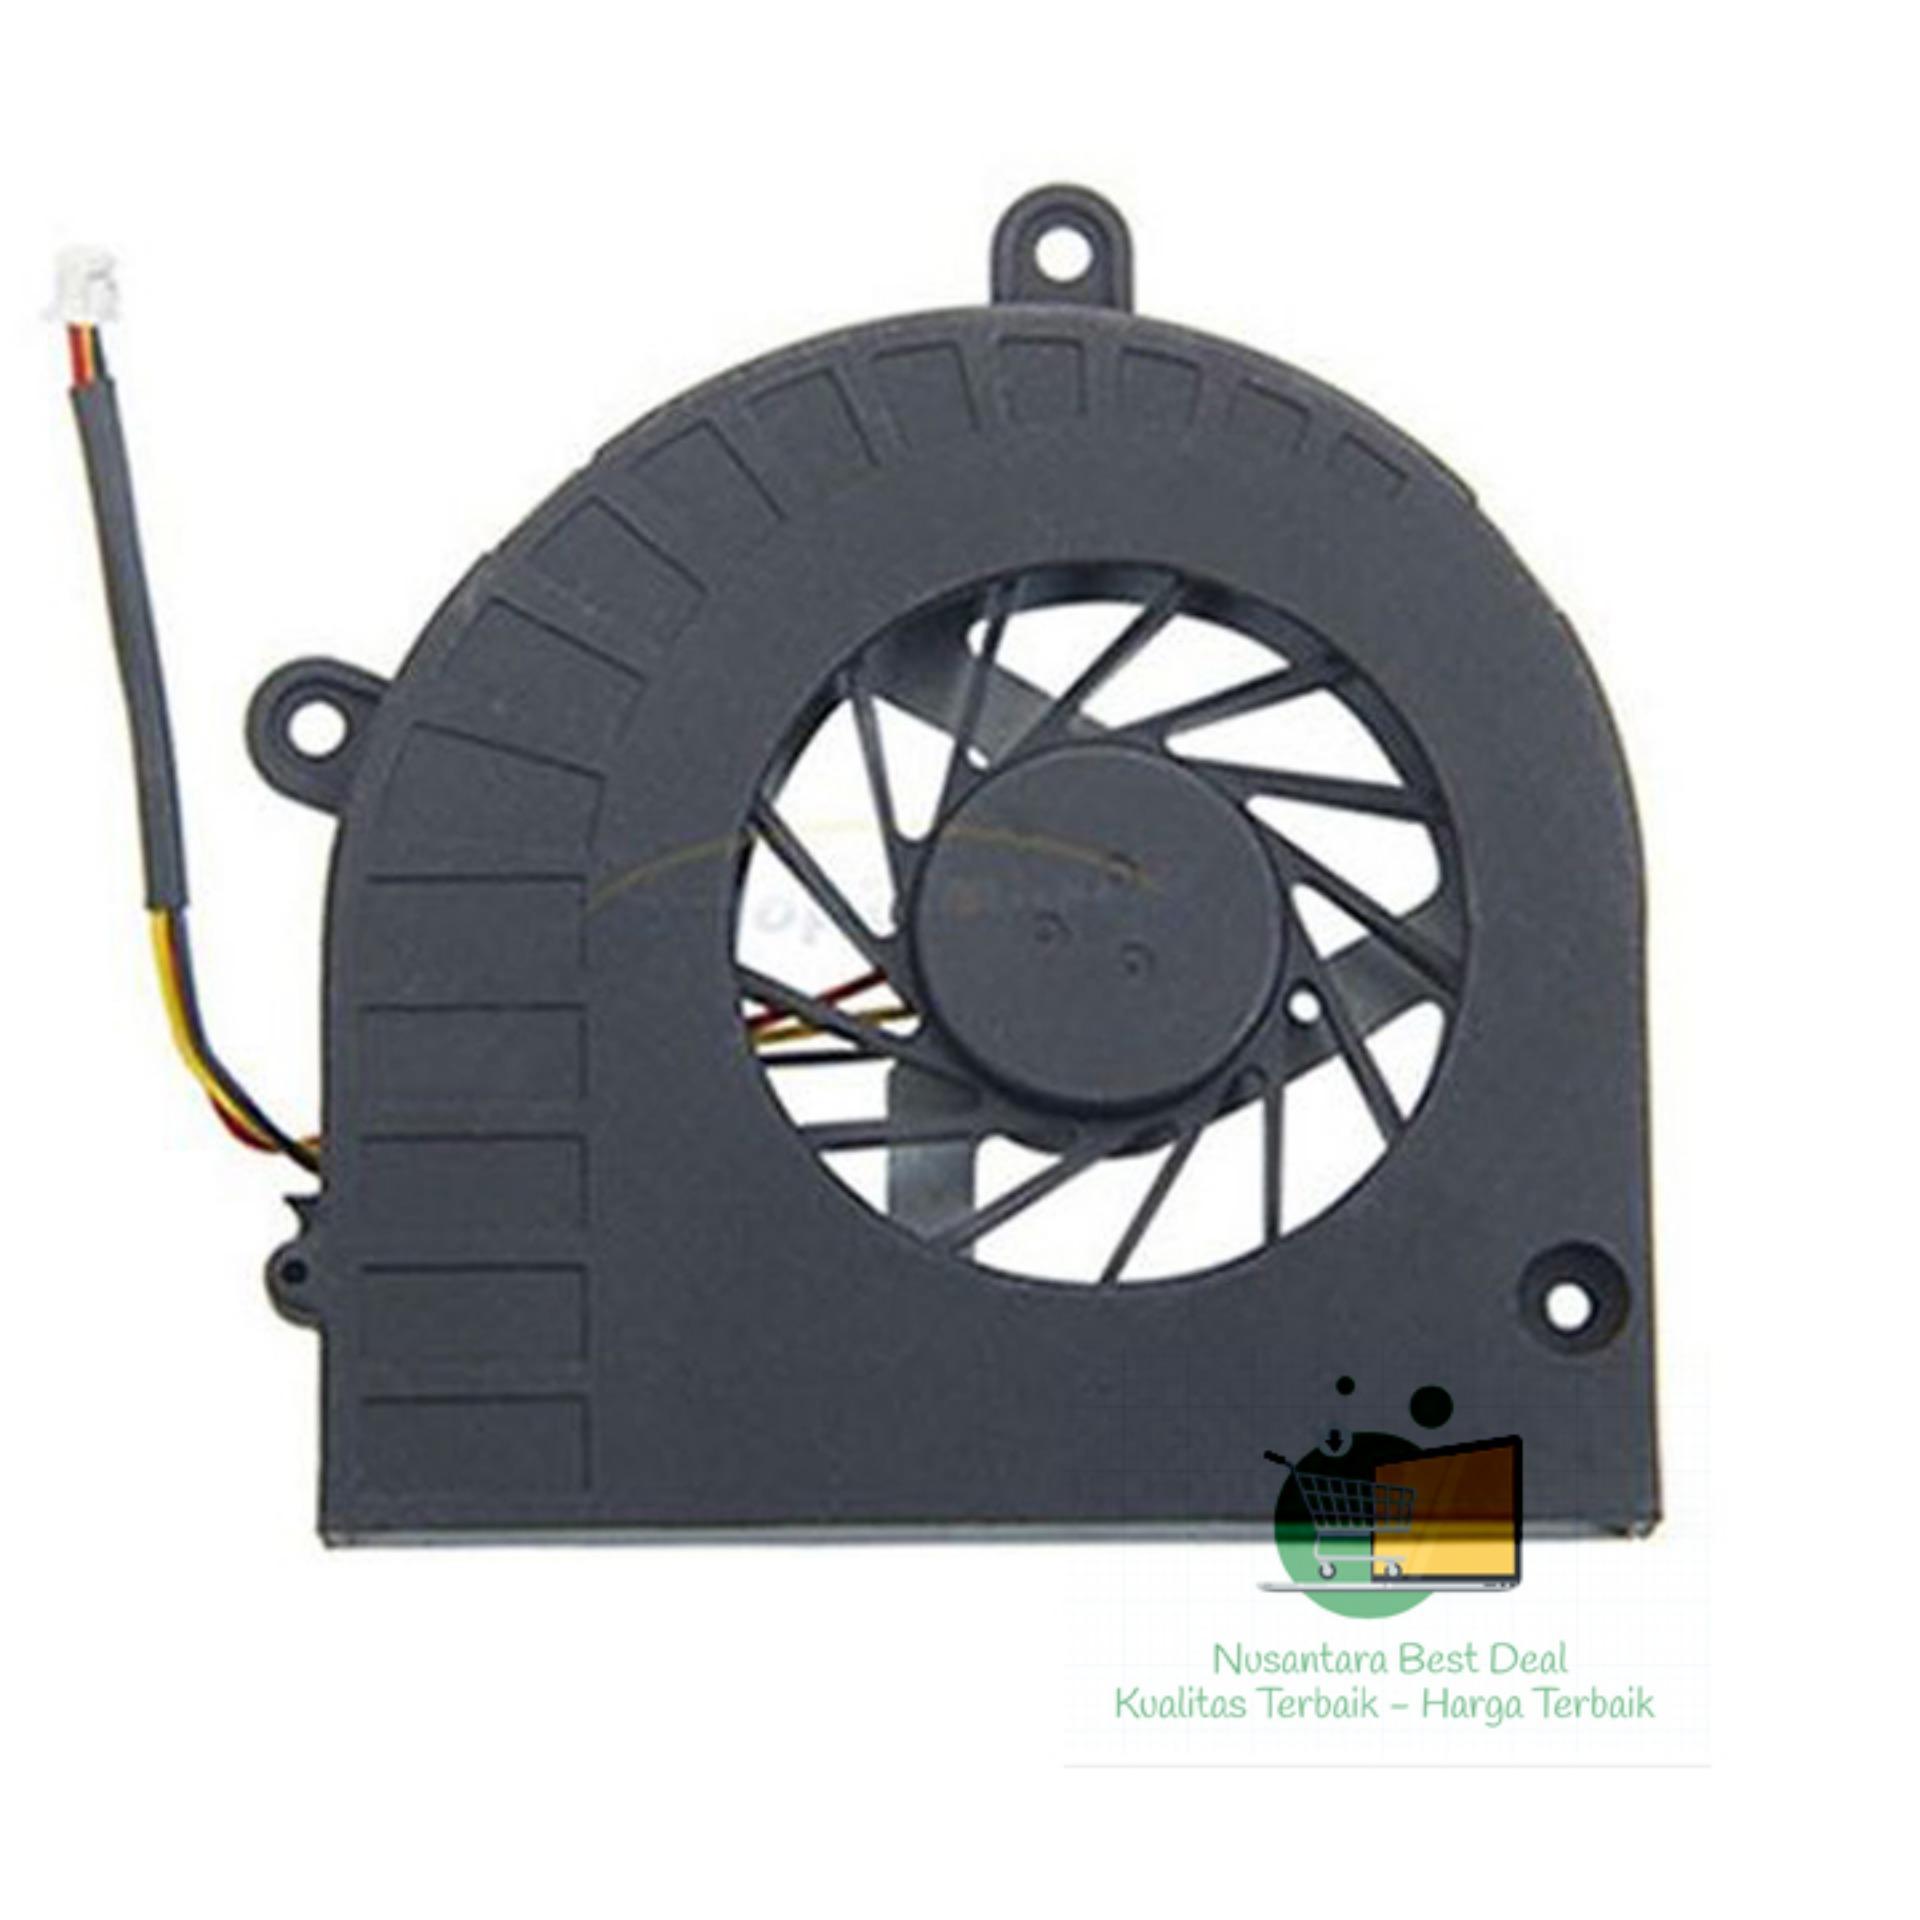 Beli Handsfree Bluetooth For Asus 41 Black White Free Kipas Usb Cooling Fan Processor Laptop A40 A40j A42 A42j A42jr K42 K42j X42 Series K43u